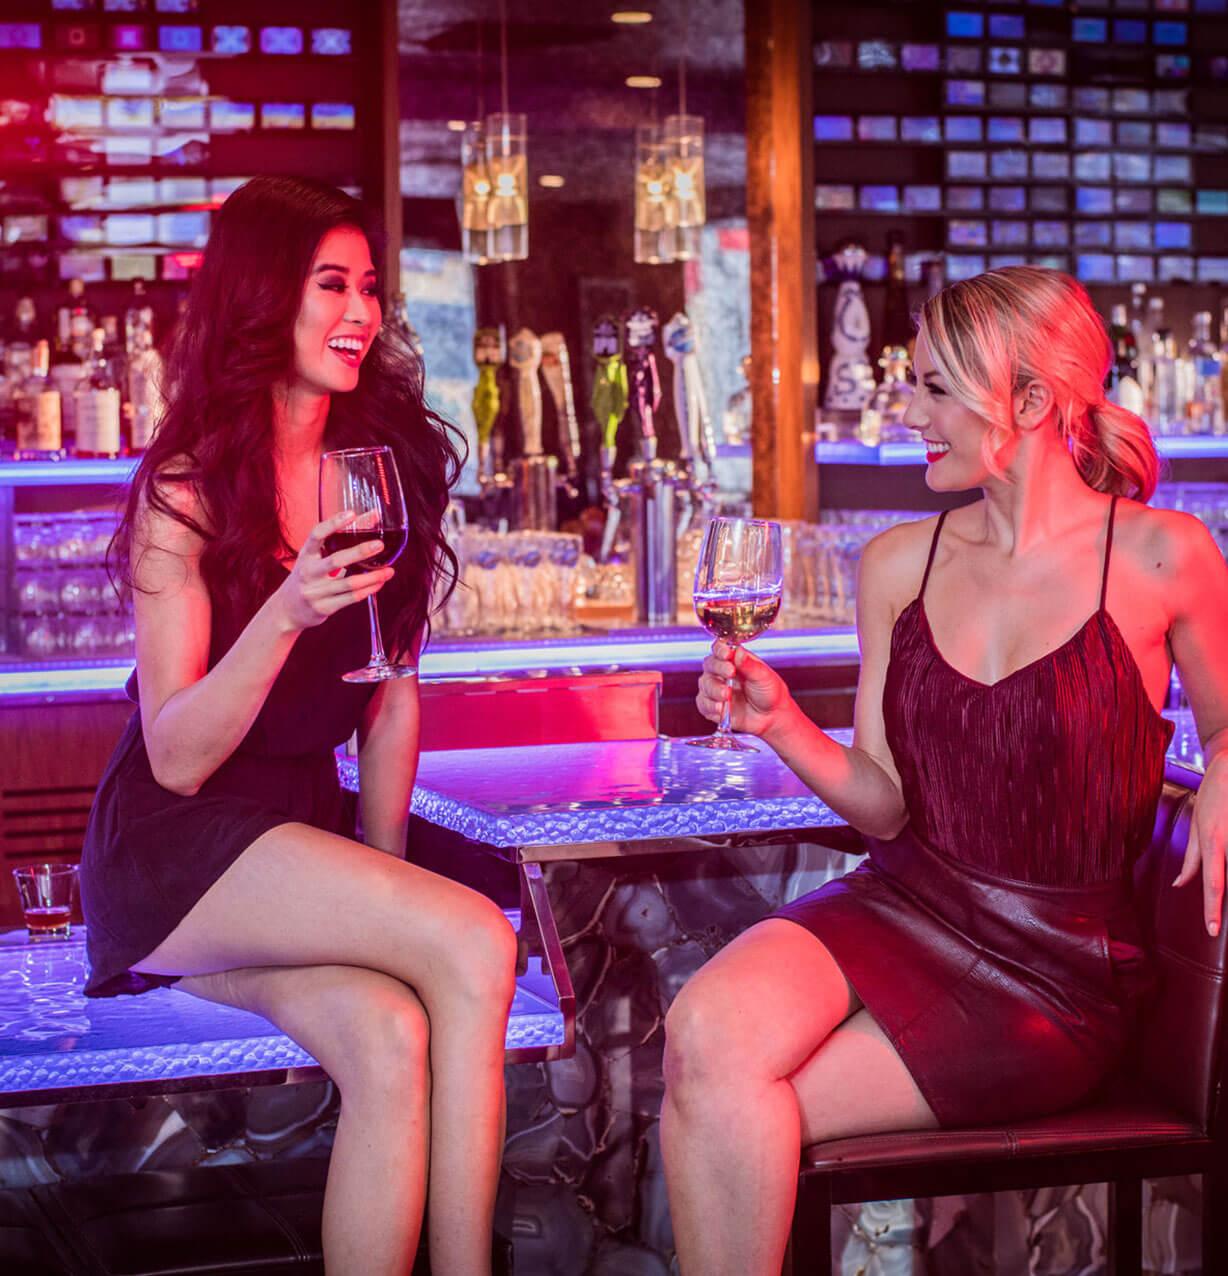 Two woman enjoying wine at Nixo